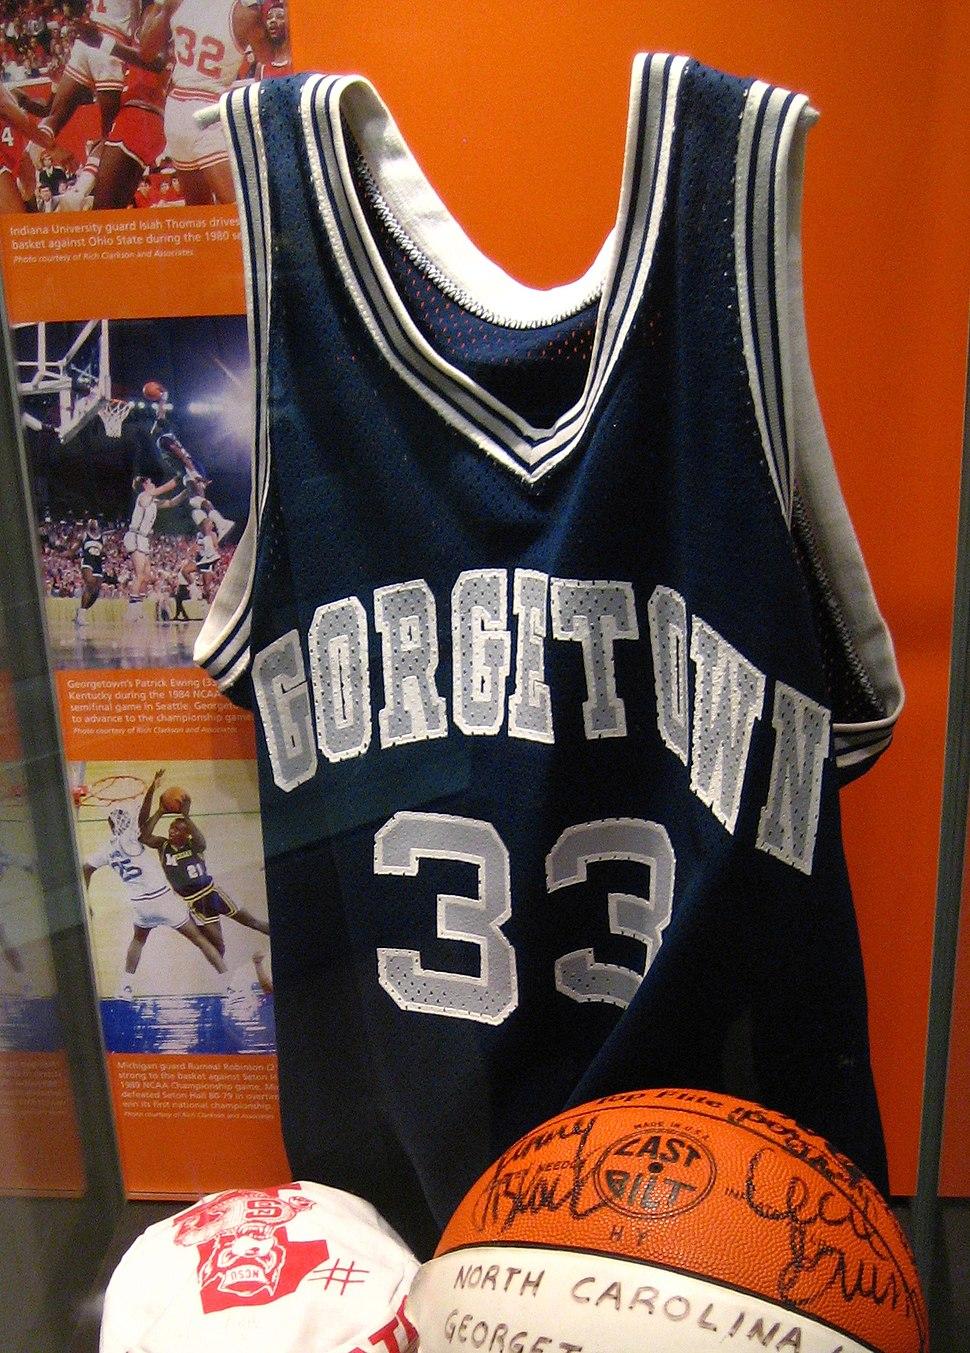 Georgetown Patrick Ewing jersey